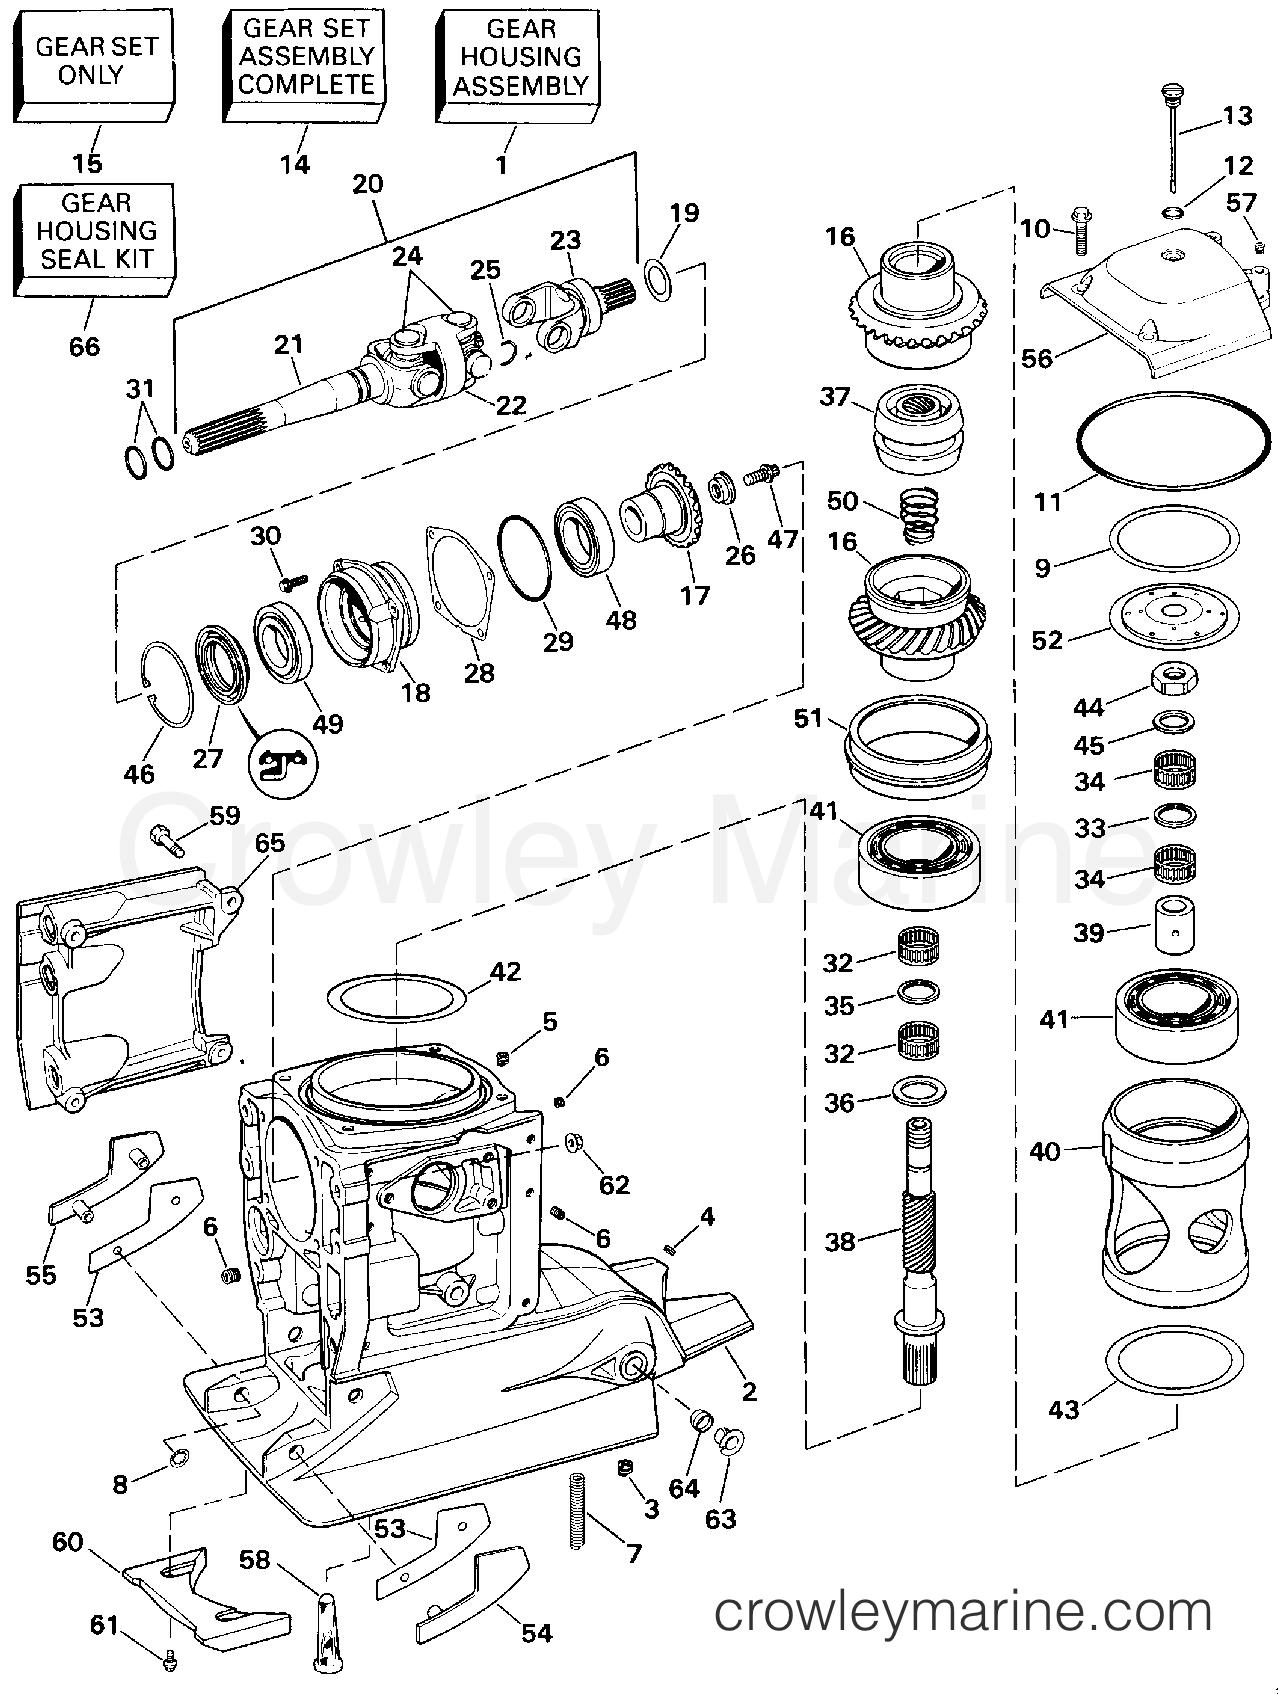 1994 OMC Stern Drive 5.8 - 58FBDPMDA - UPPER GEAR HOUSING